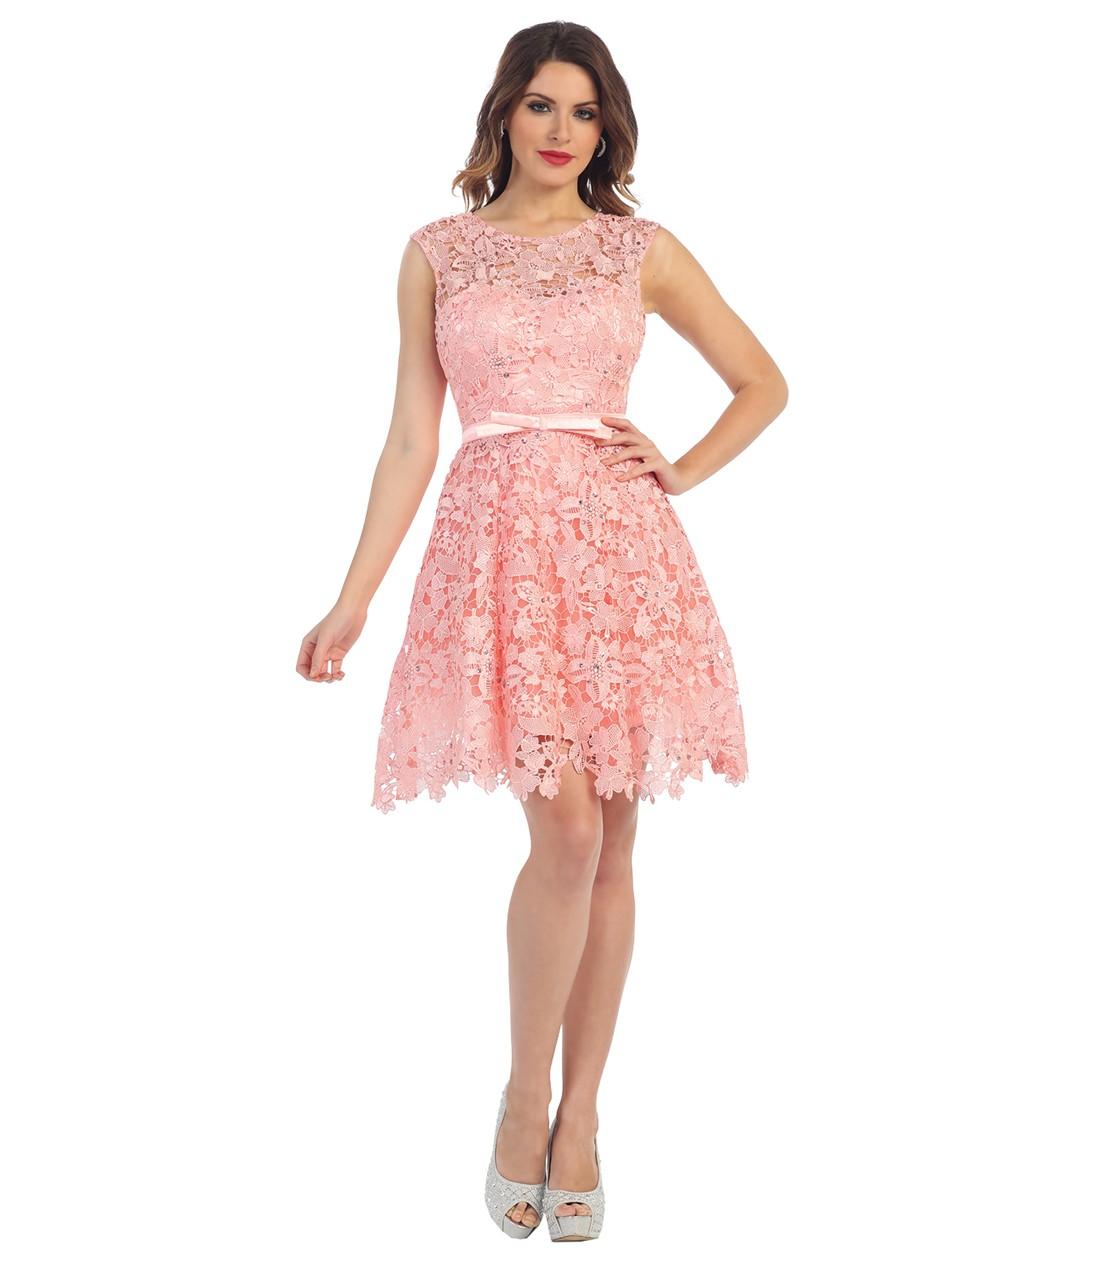 Comprar vestidos de fiesta zara – Catálogo de fotos de vestidos ...